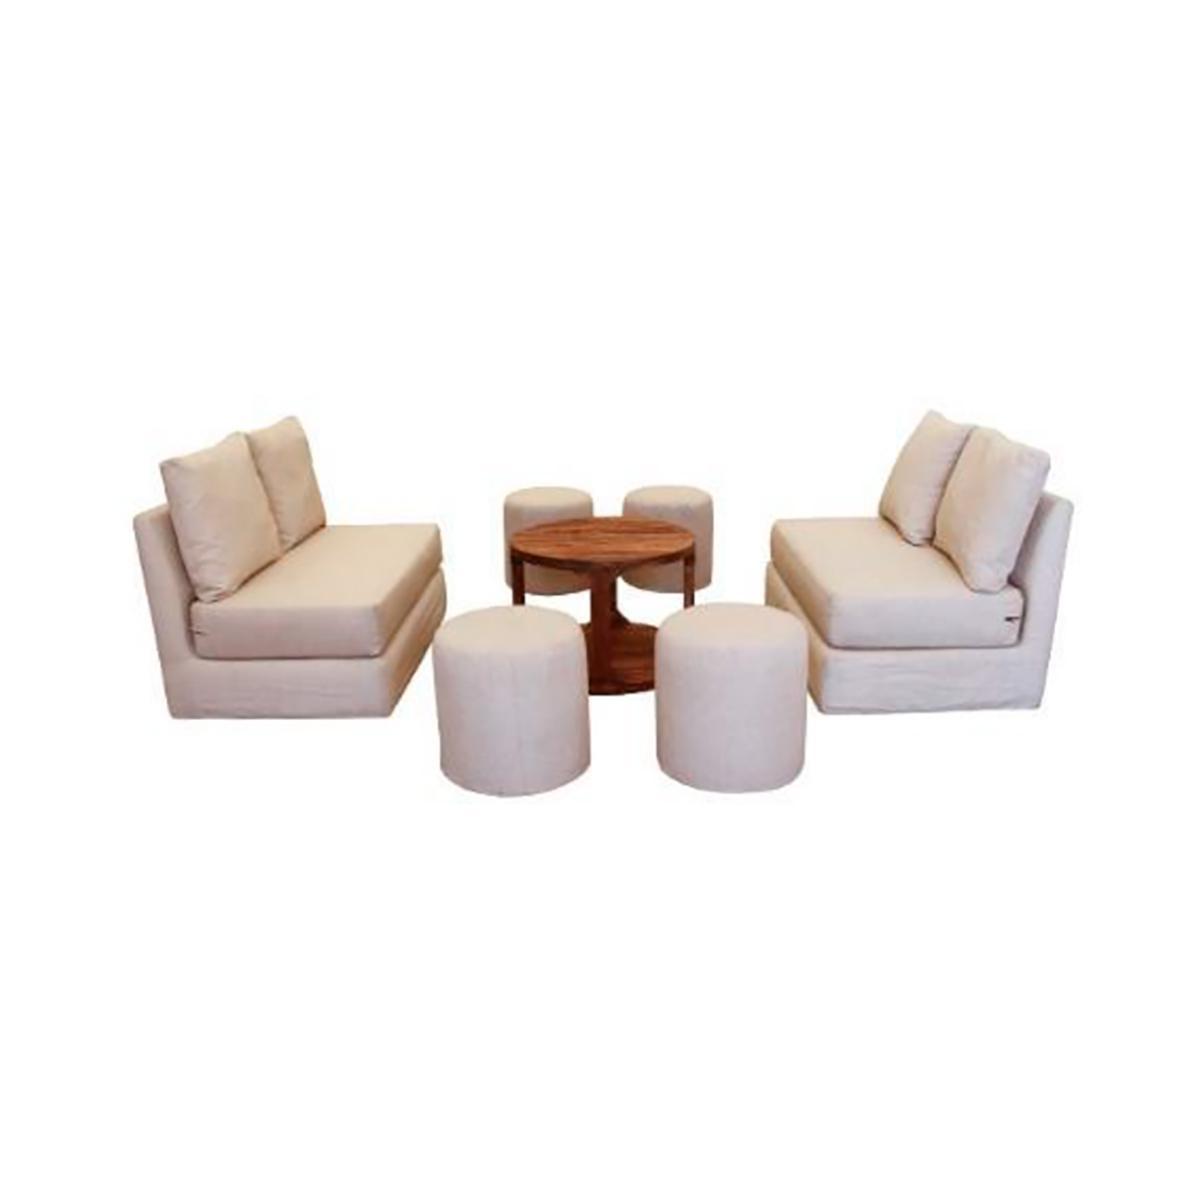 Sala cube 2 love seat beige